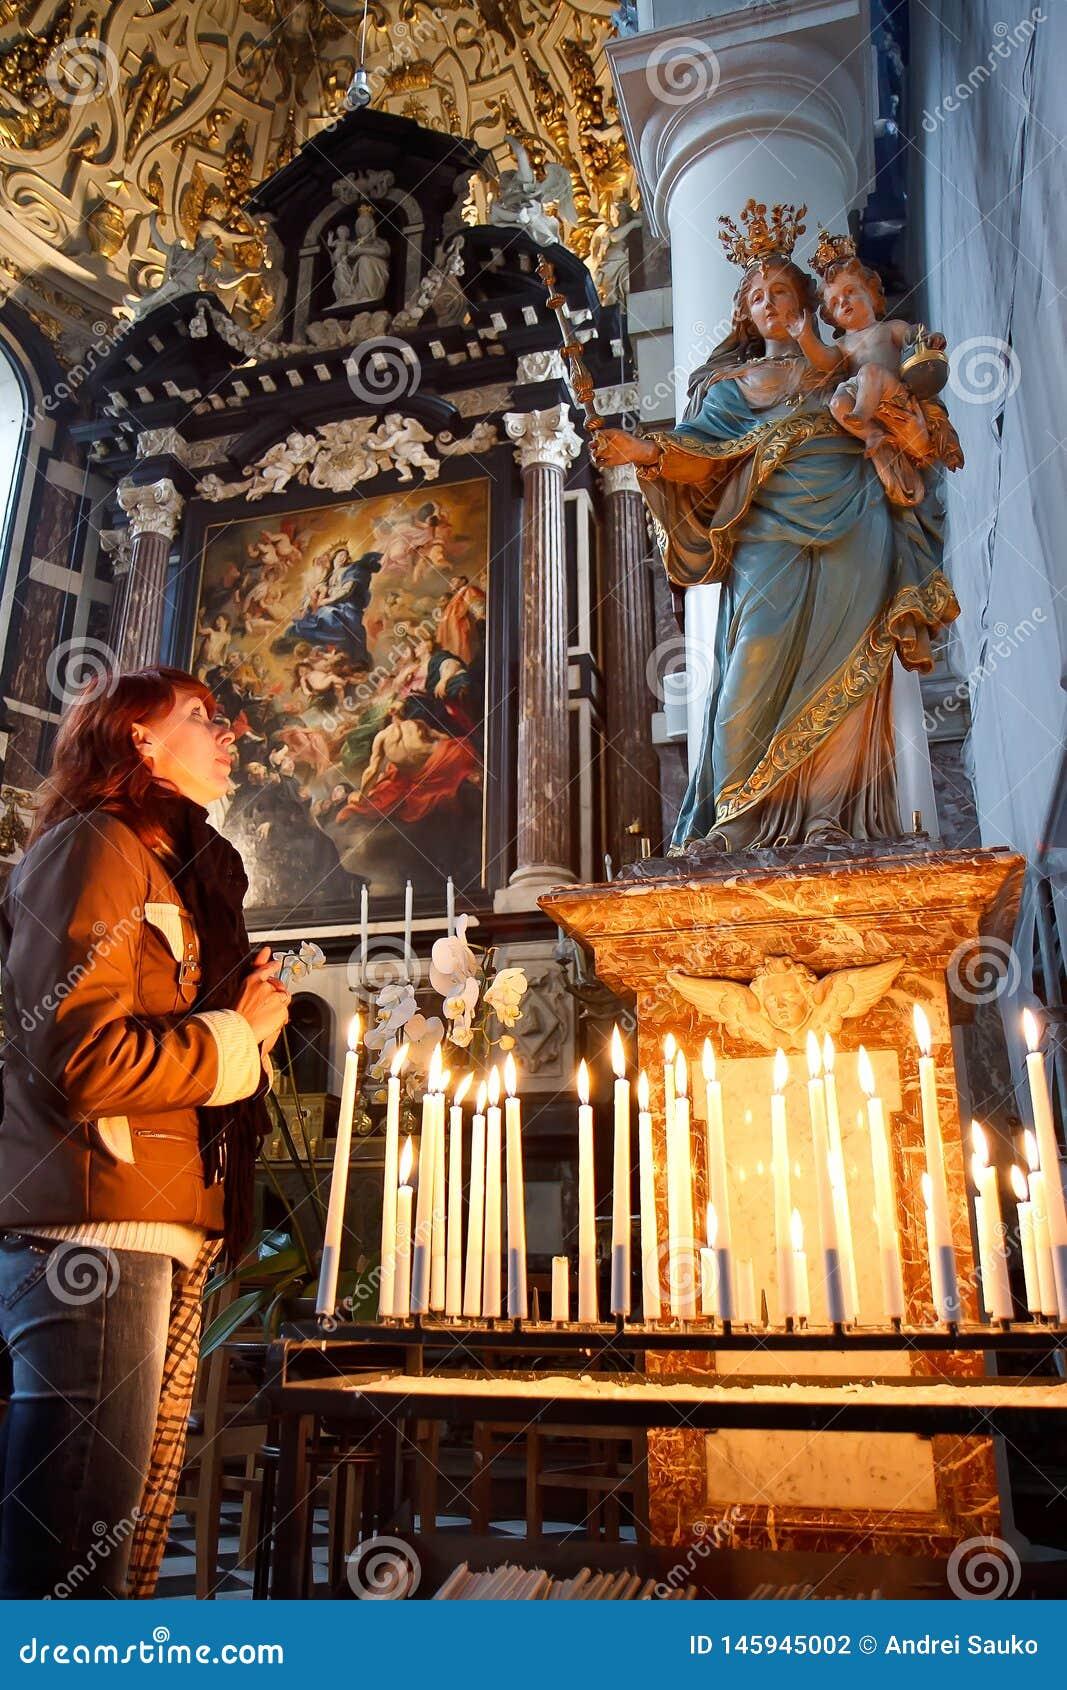 Young woman praying in a church